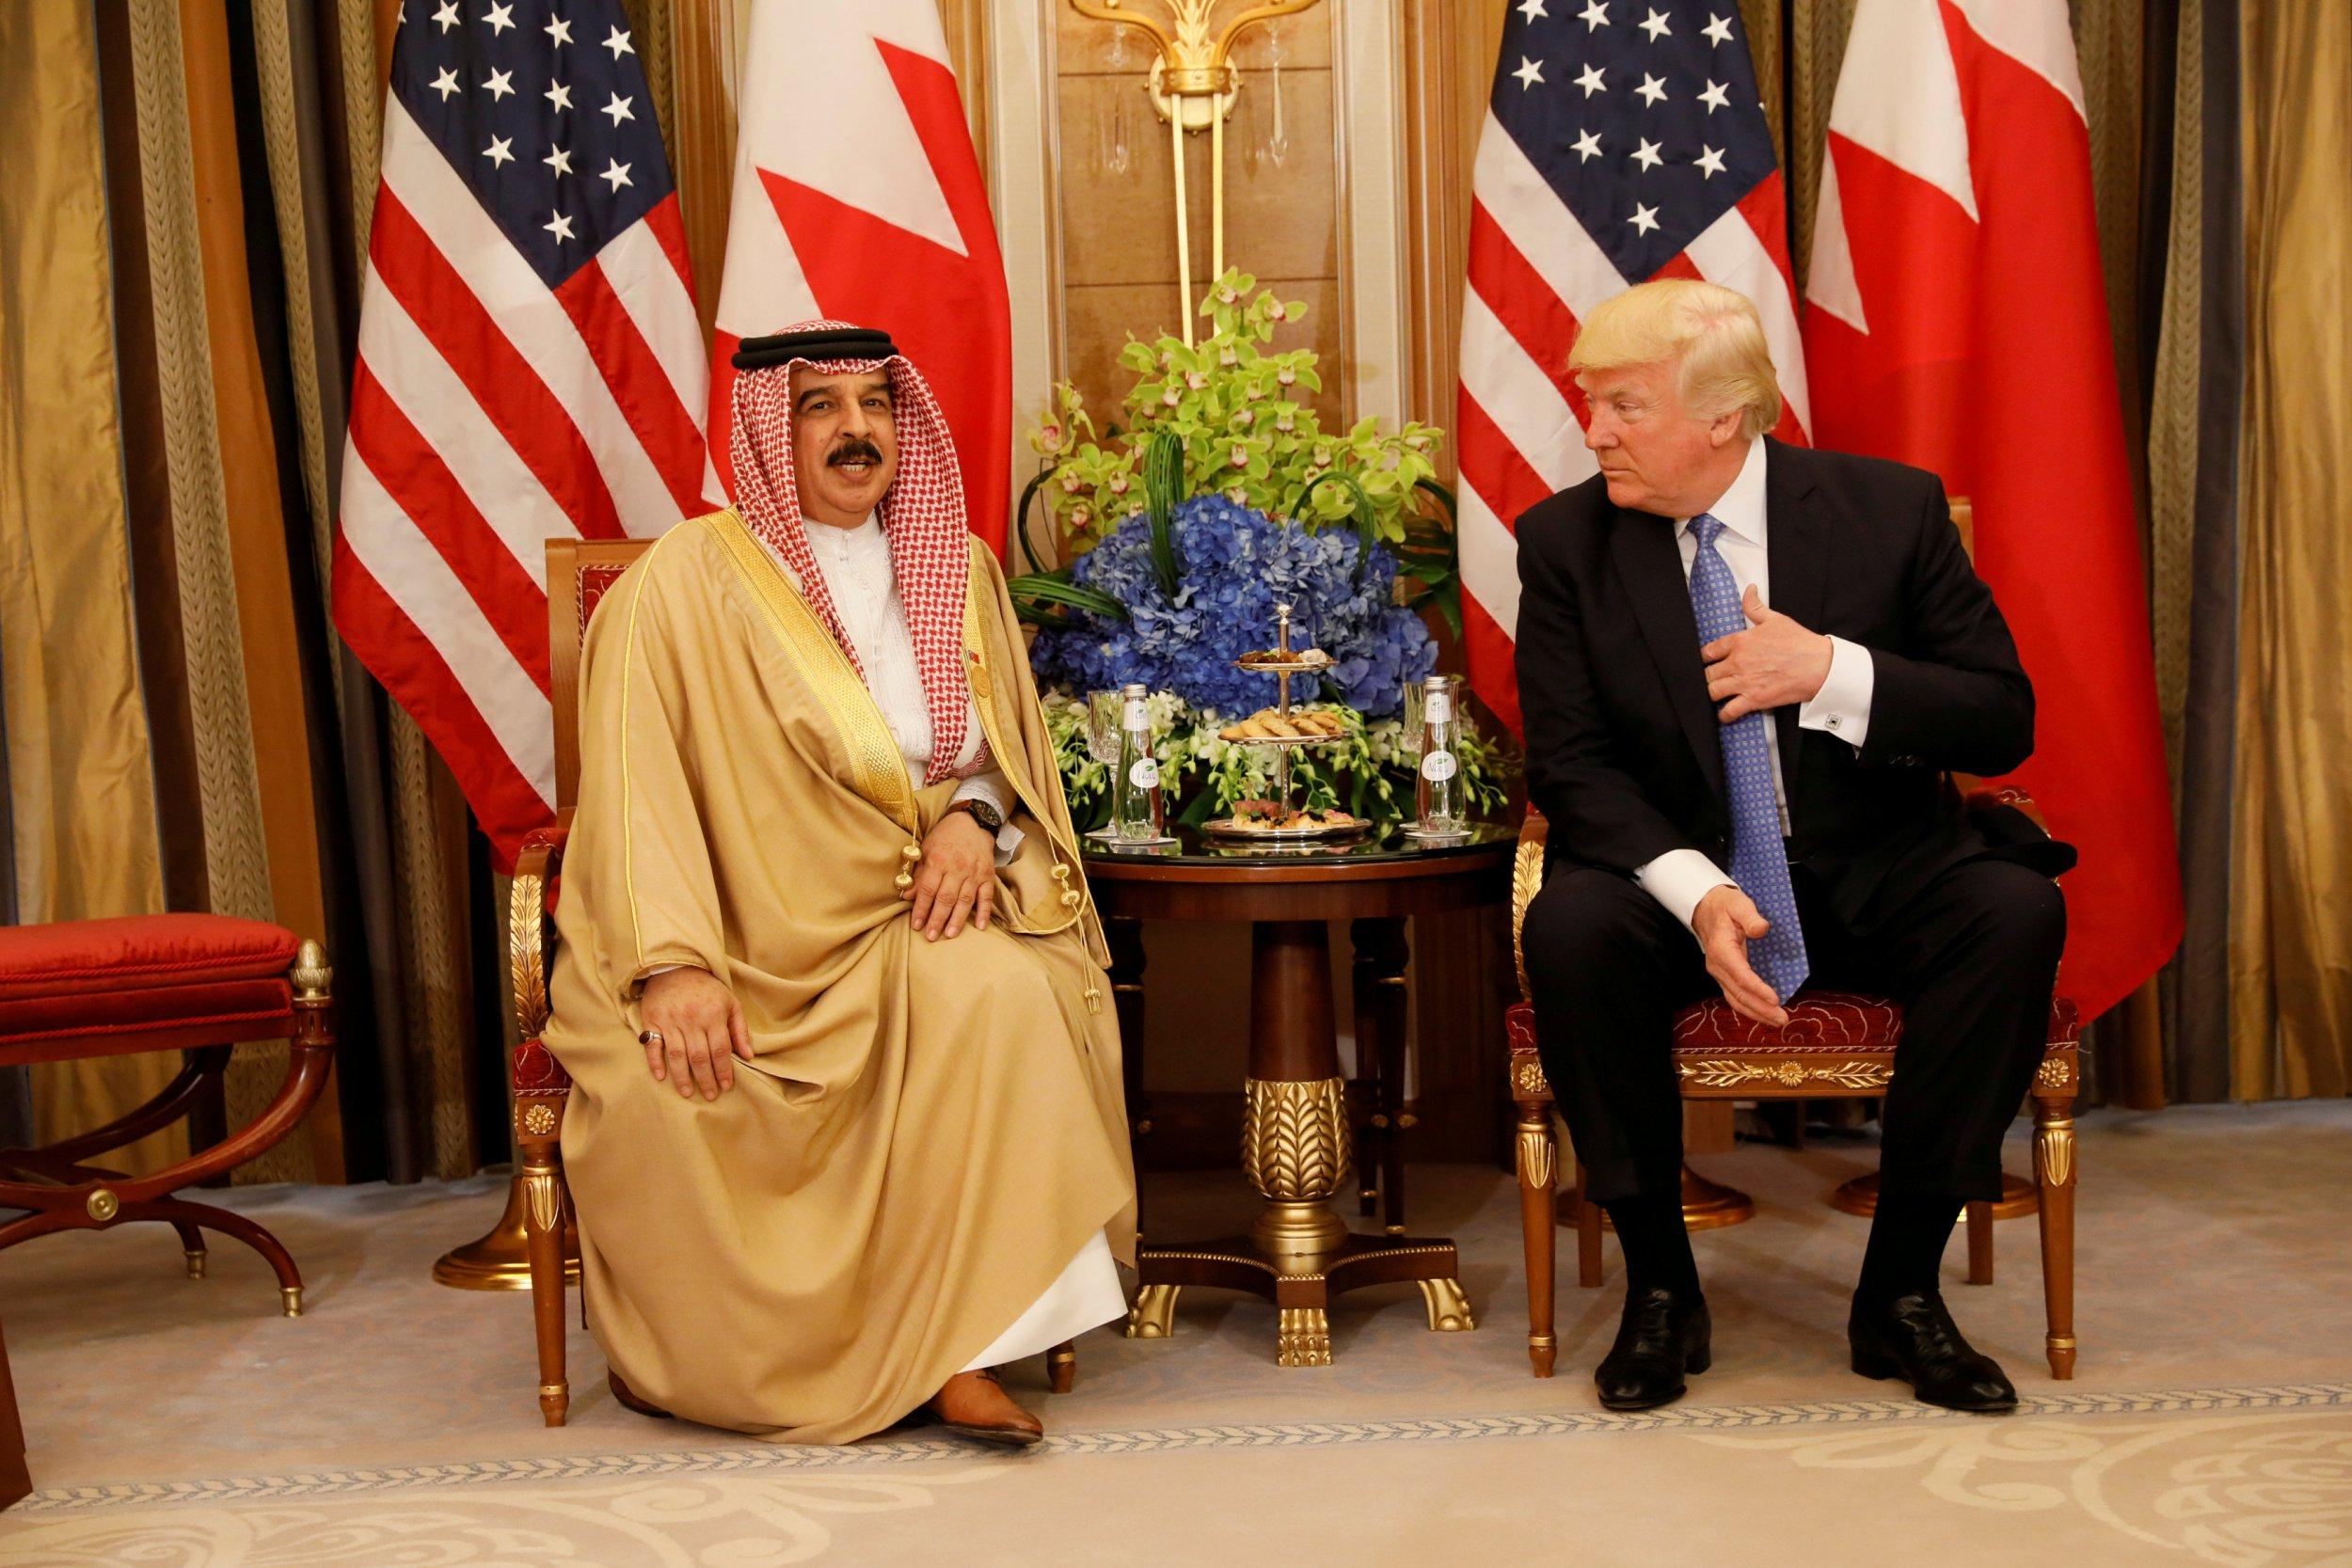 Bahrain's King Hamad bin Isa Al Khalifa and Donald Trump